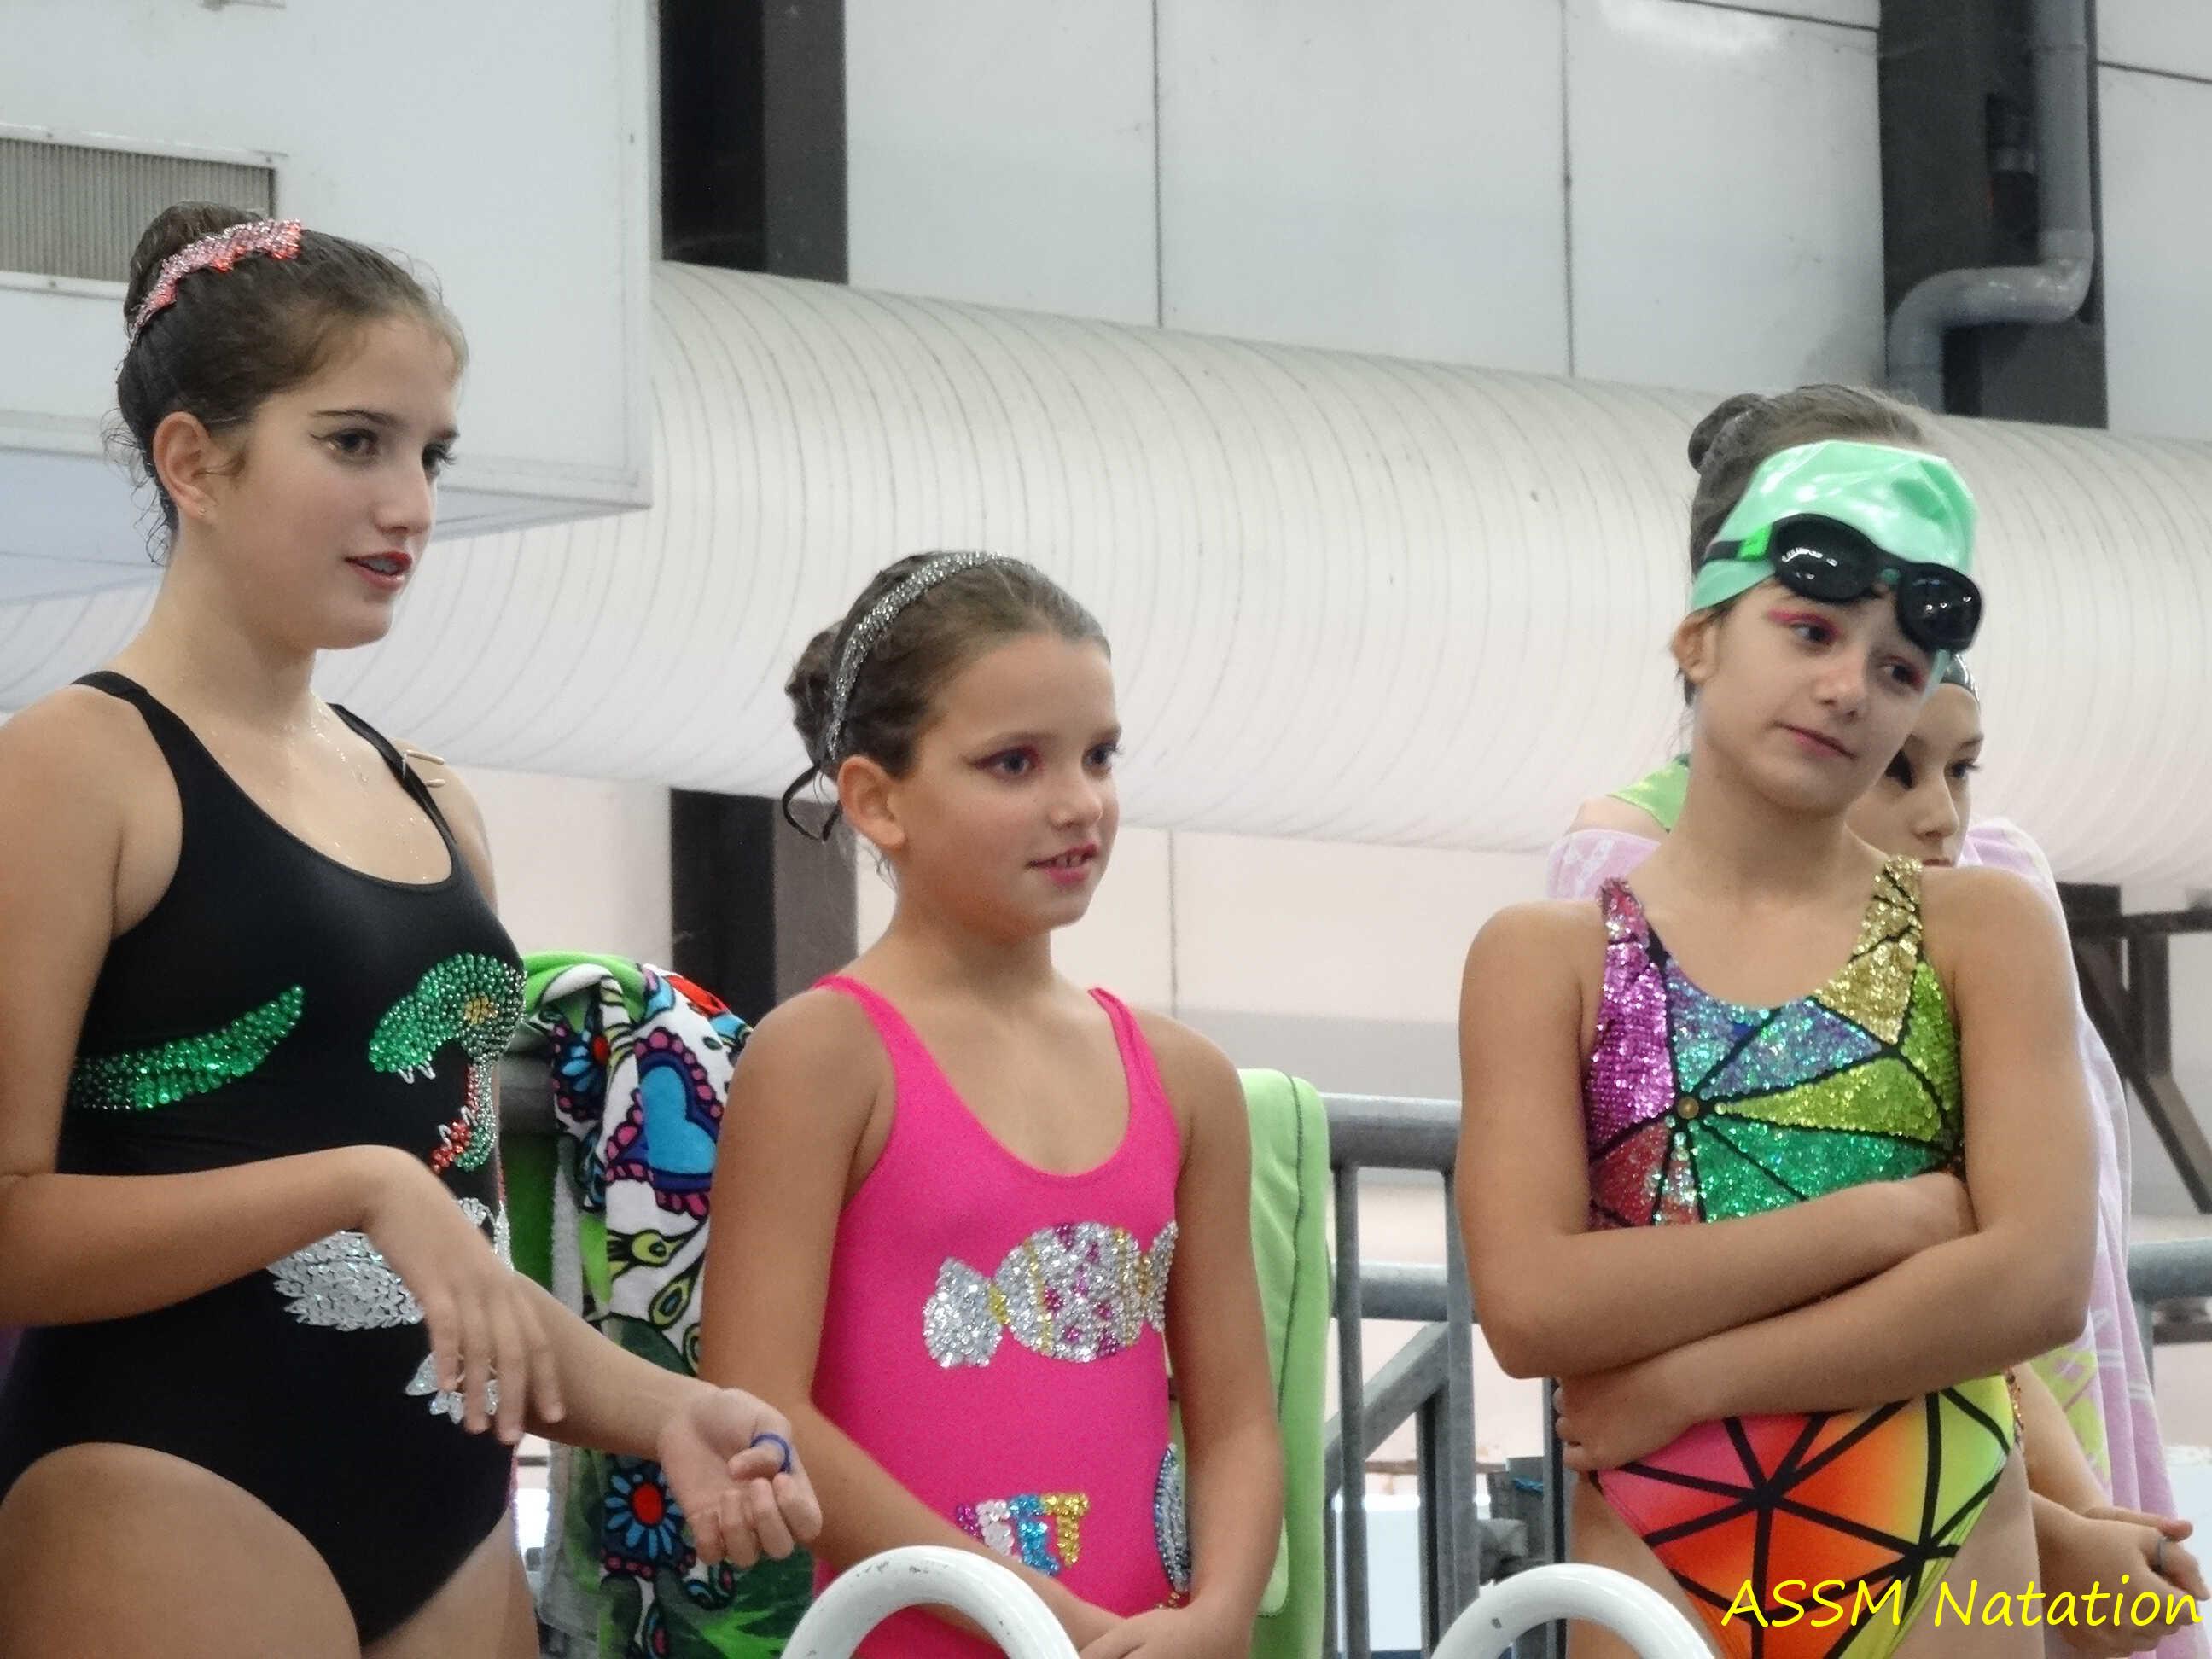 salon-vivons-sports_20161113_9